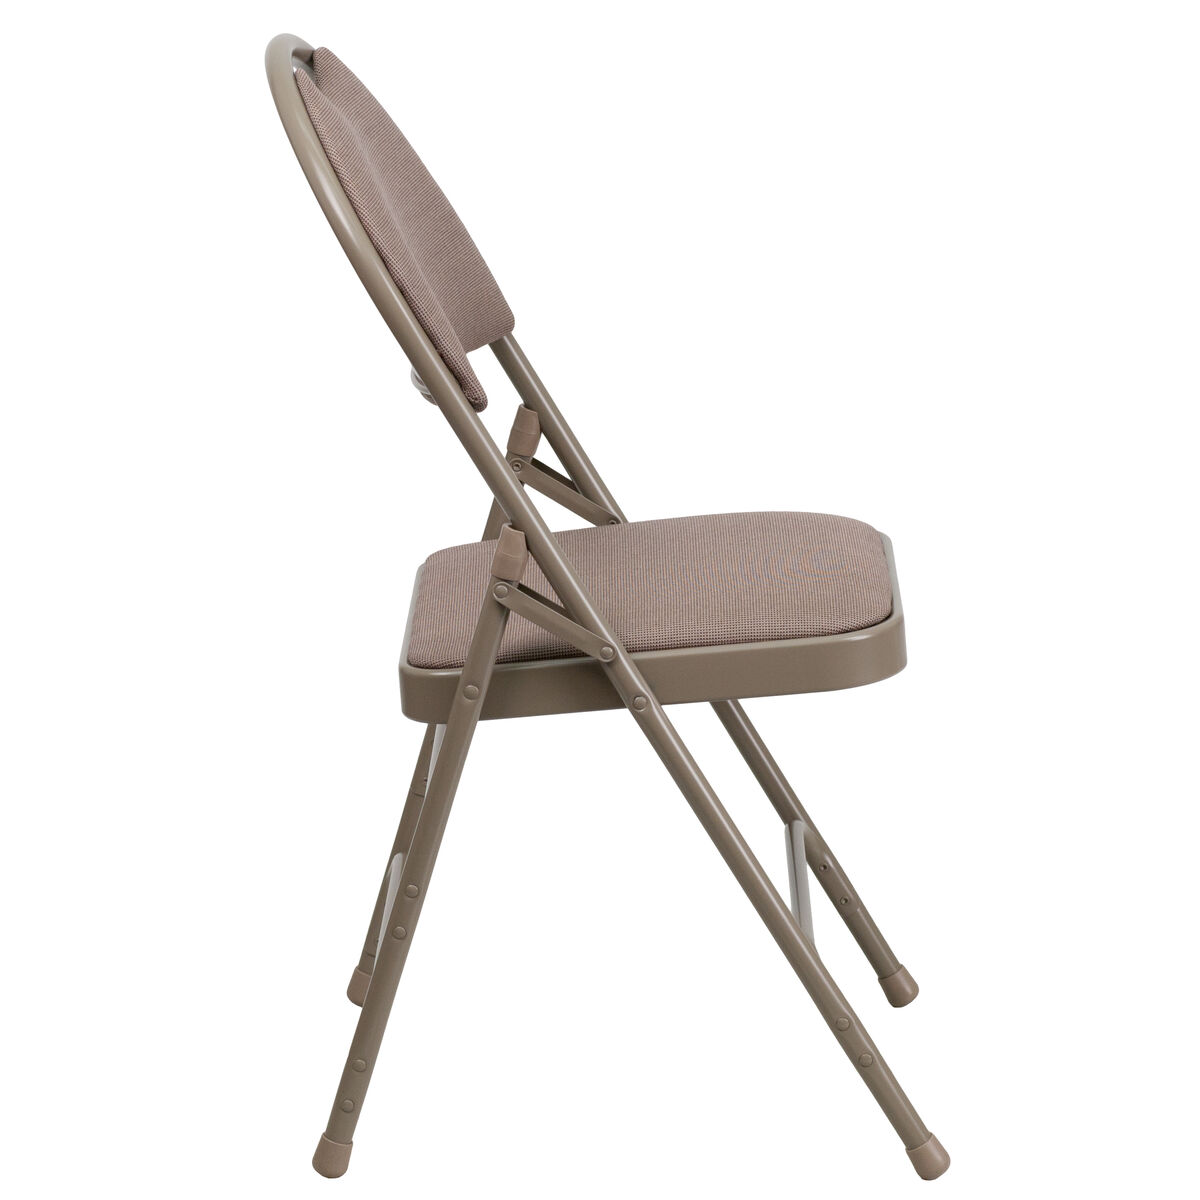 Beige Fabric Folding Chair Ha Mc705af 3 Bge Gg